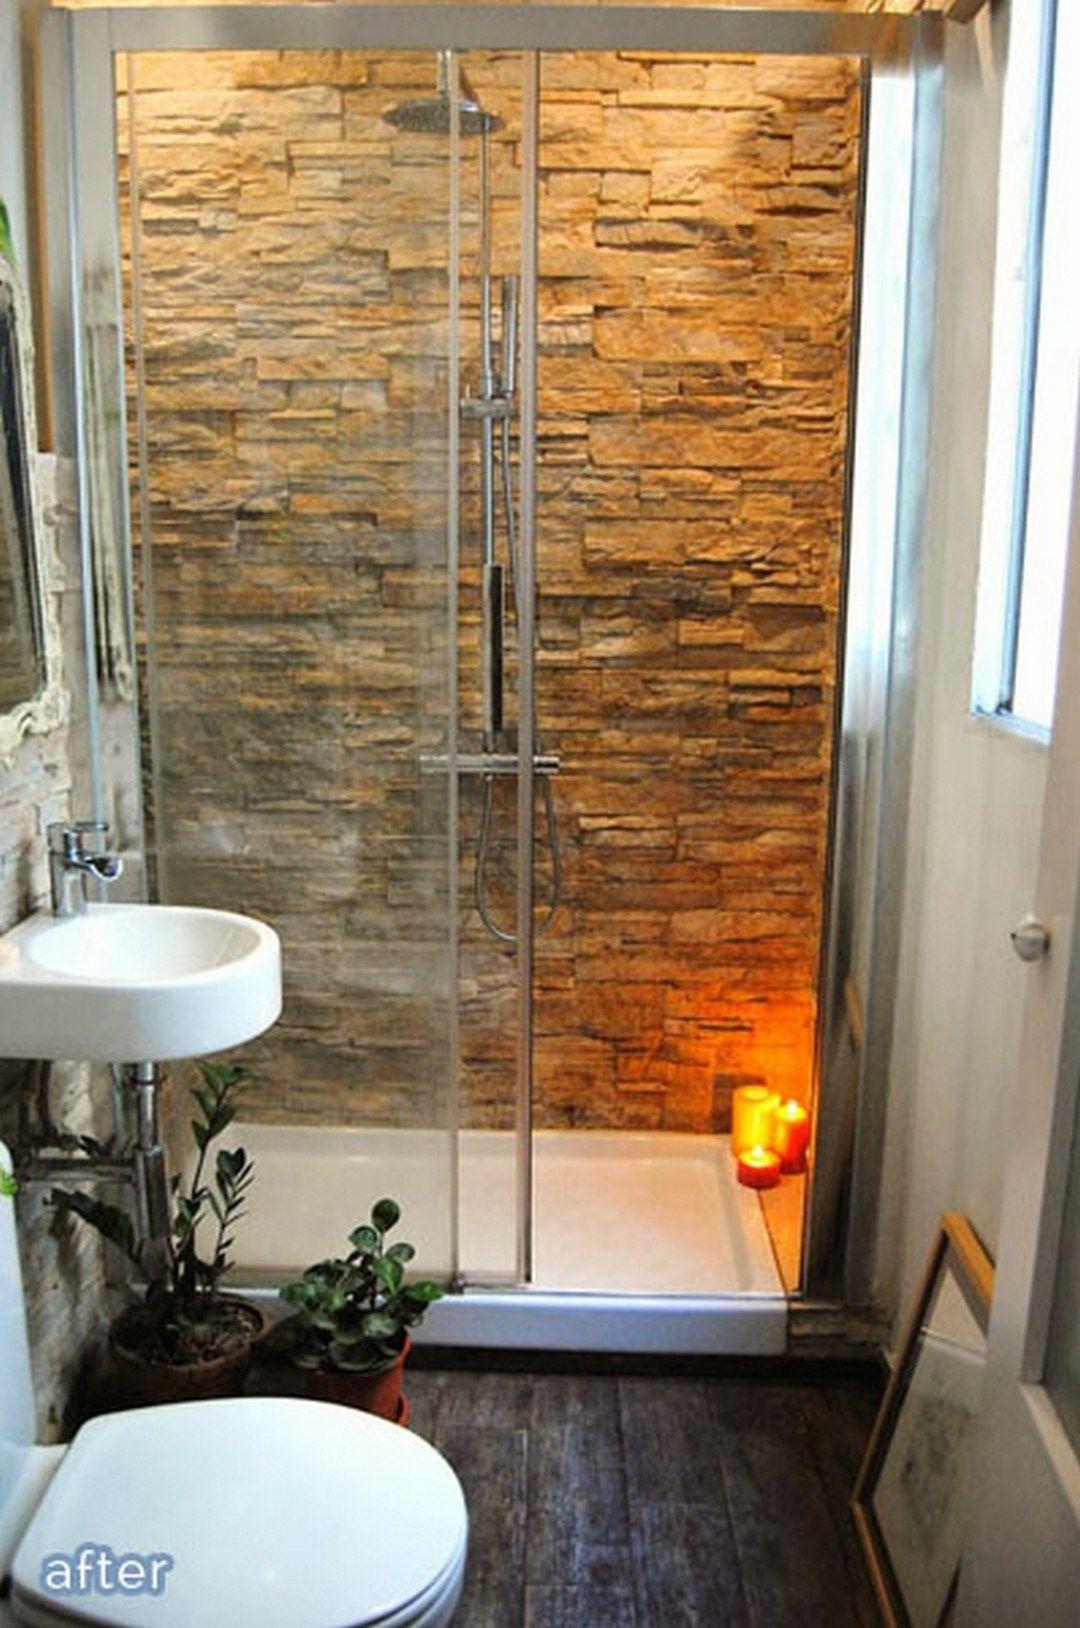 Comment Fabriquer Meuble Salle De Bain Beton Cellulaire ~ 99 Small Master Bathroom Makeover Ideas On A Budget 69 Home